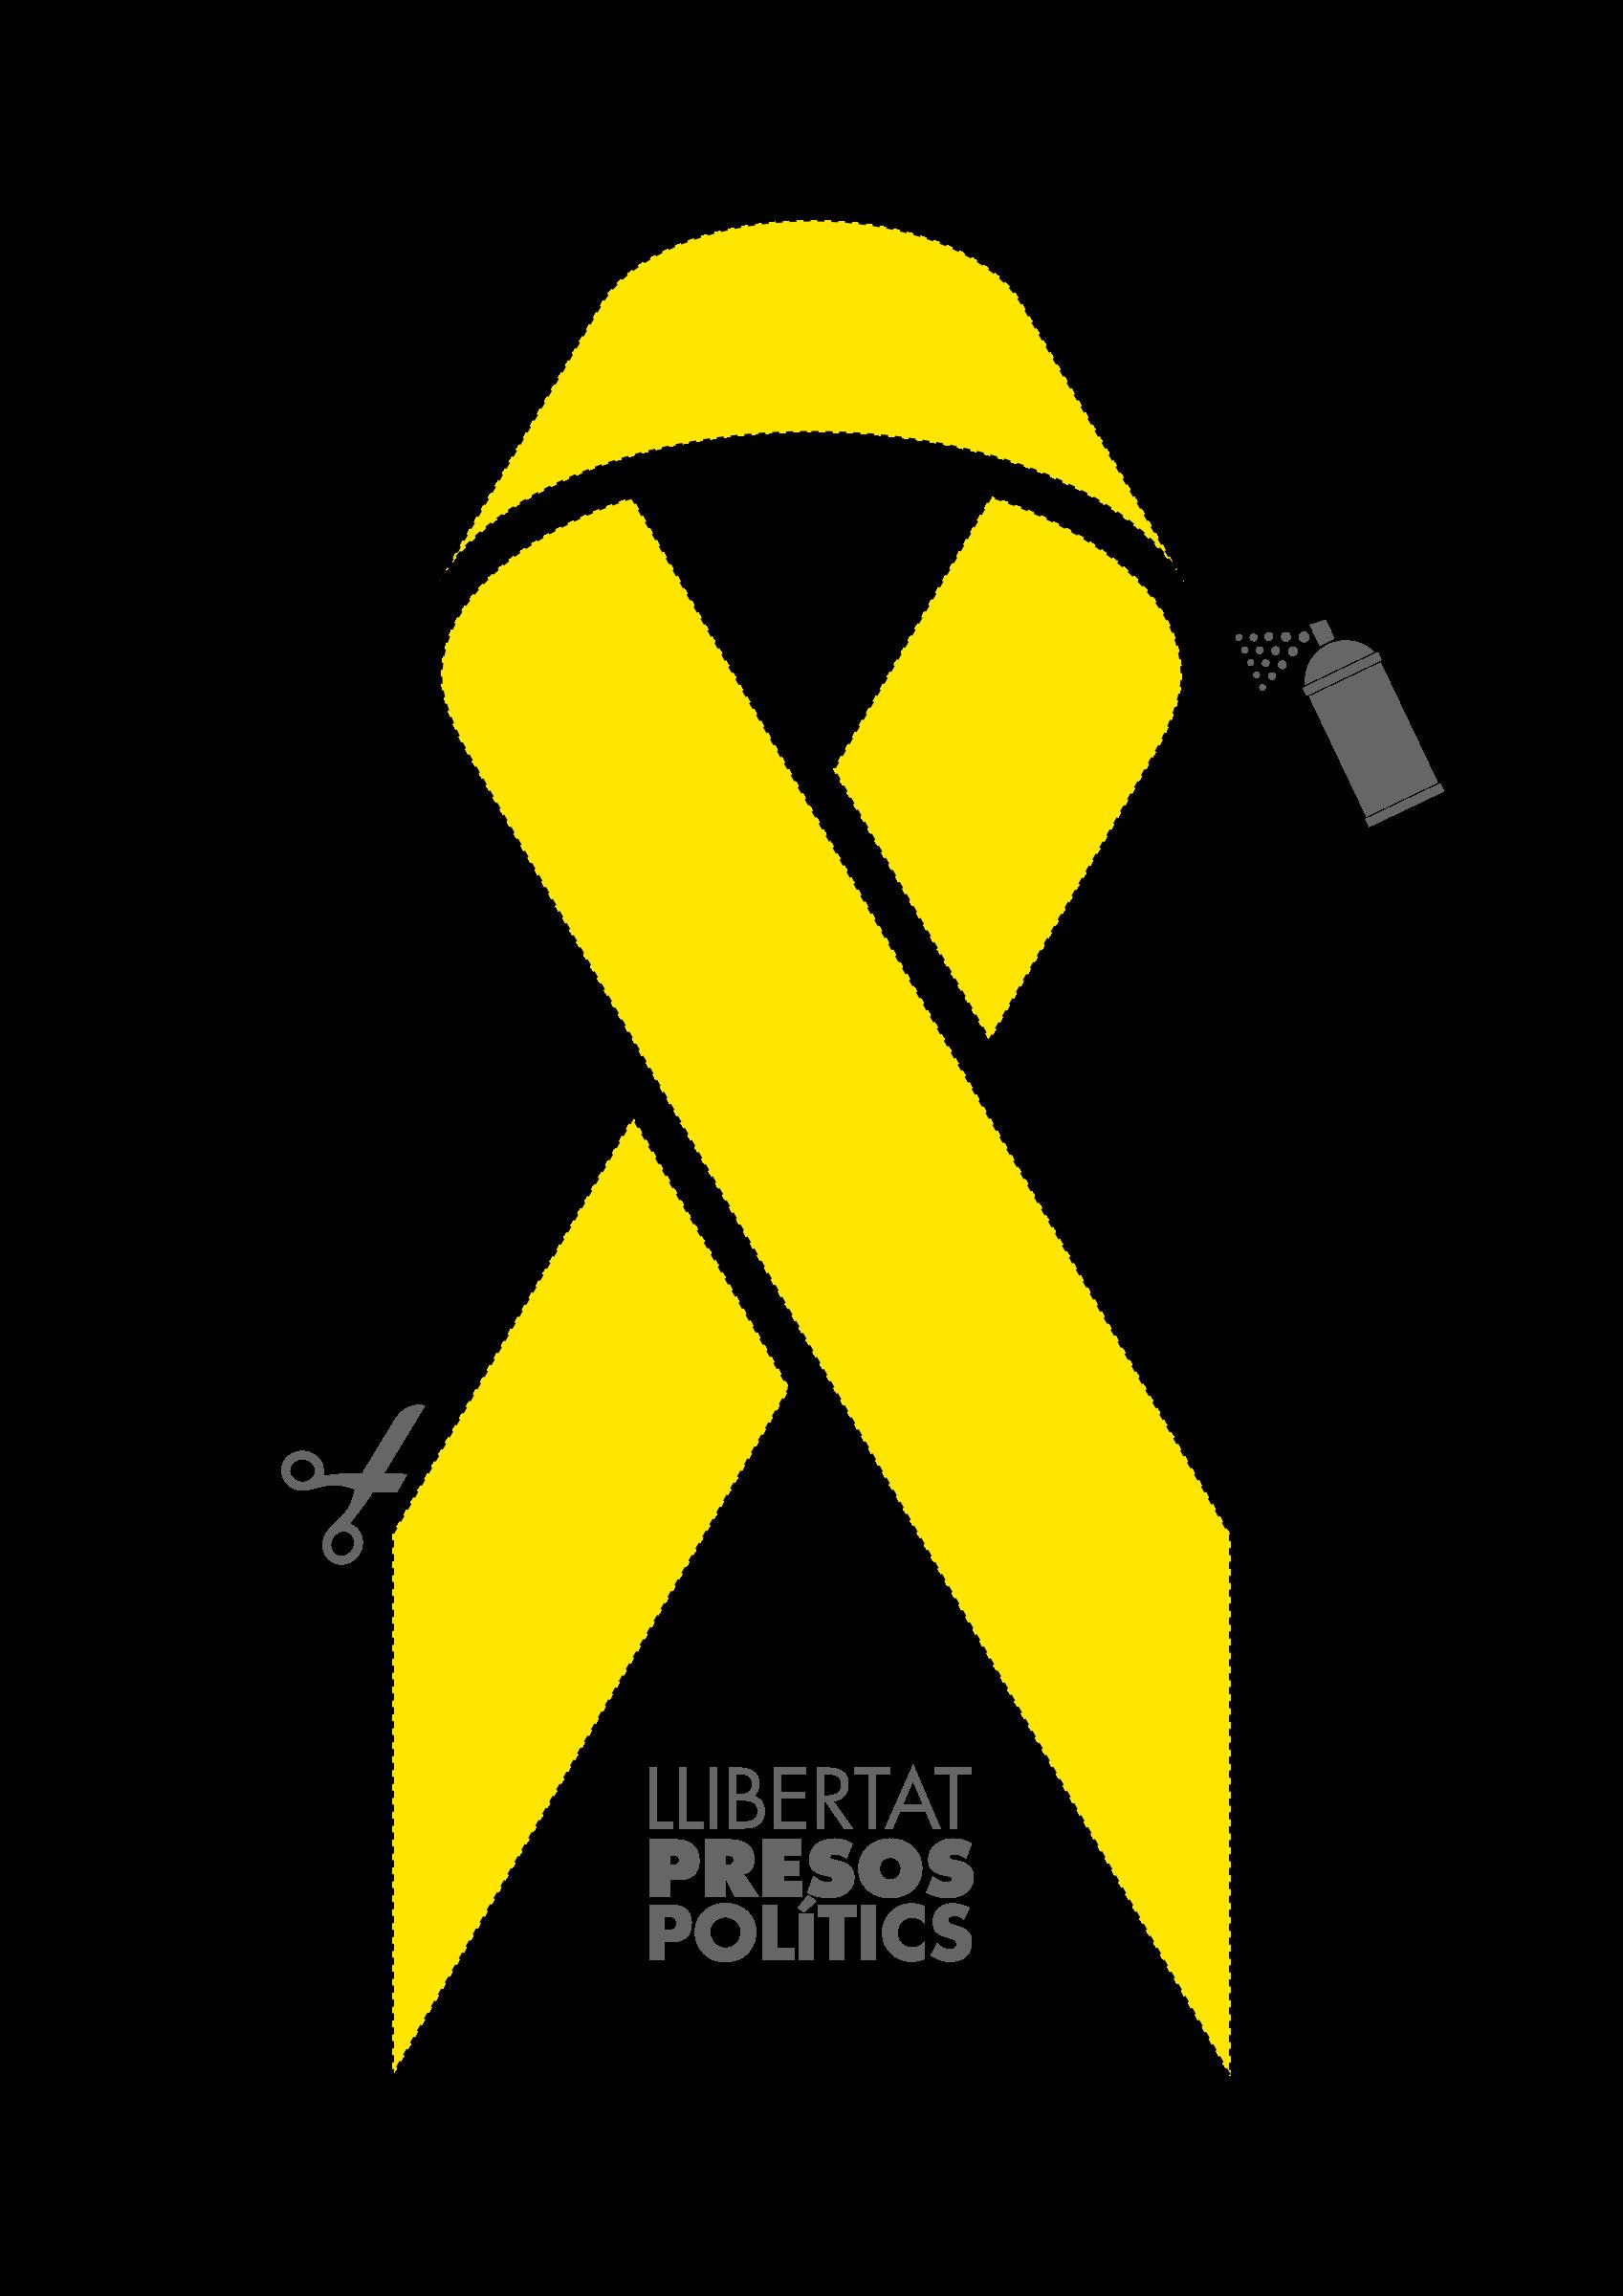 Yellow ribbon stencil big. Politics clipart political freedom